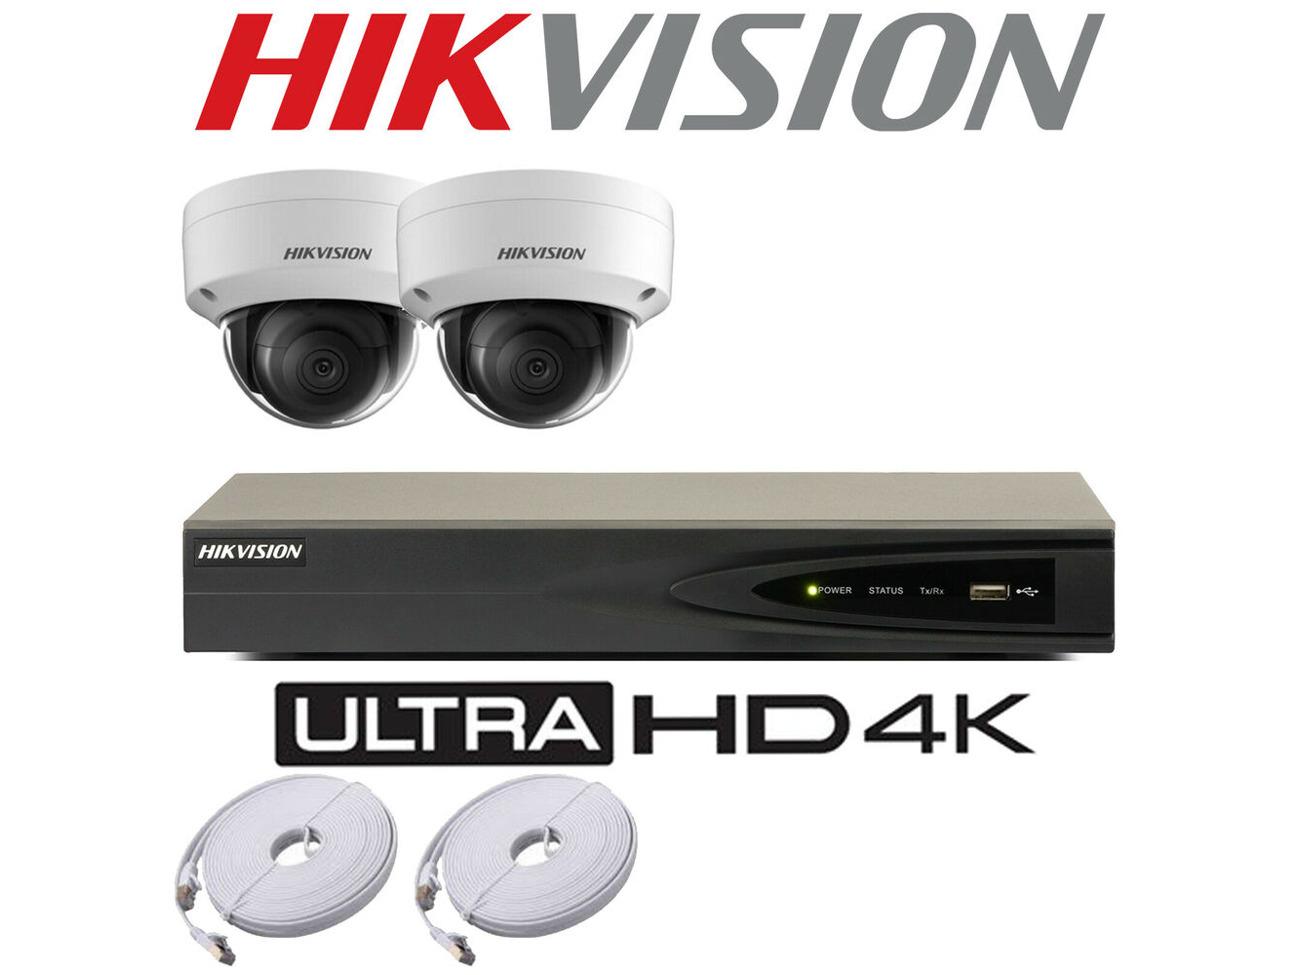 Buy HIKVISION 5MP IP POE SYSTEM 4K UHD 4CH CHANNEL NVR CCTV